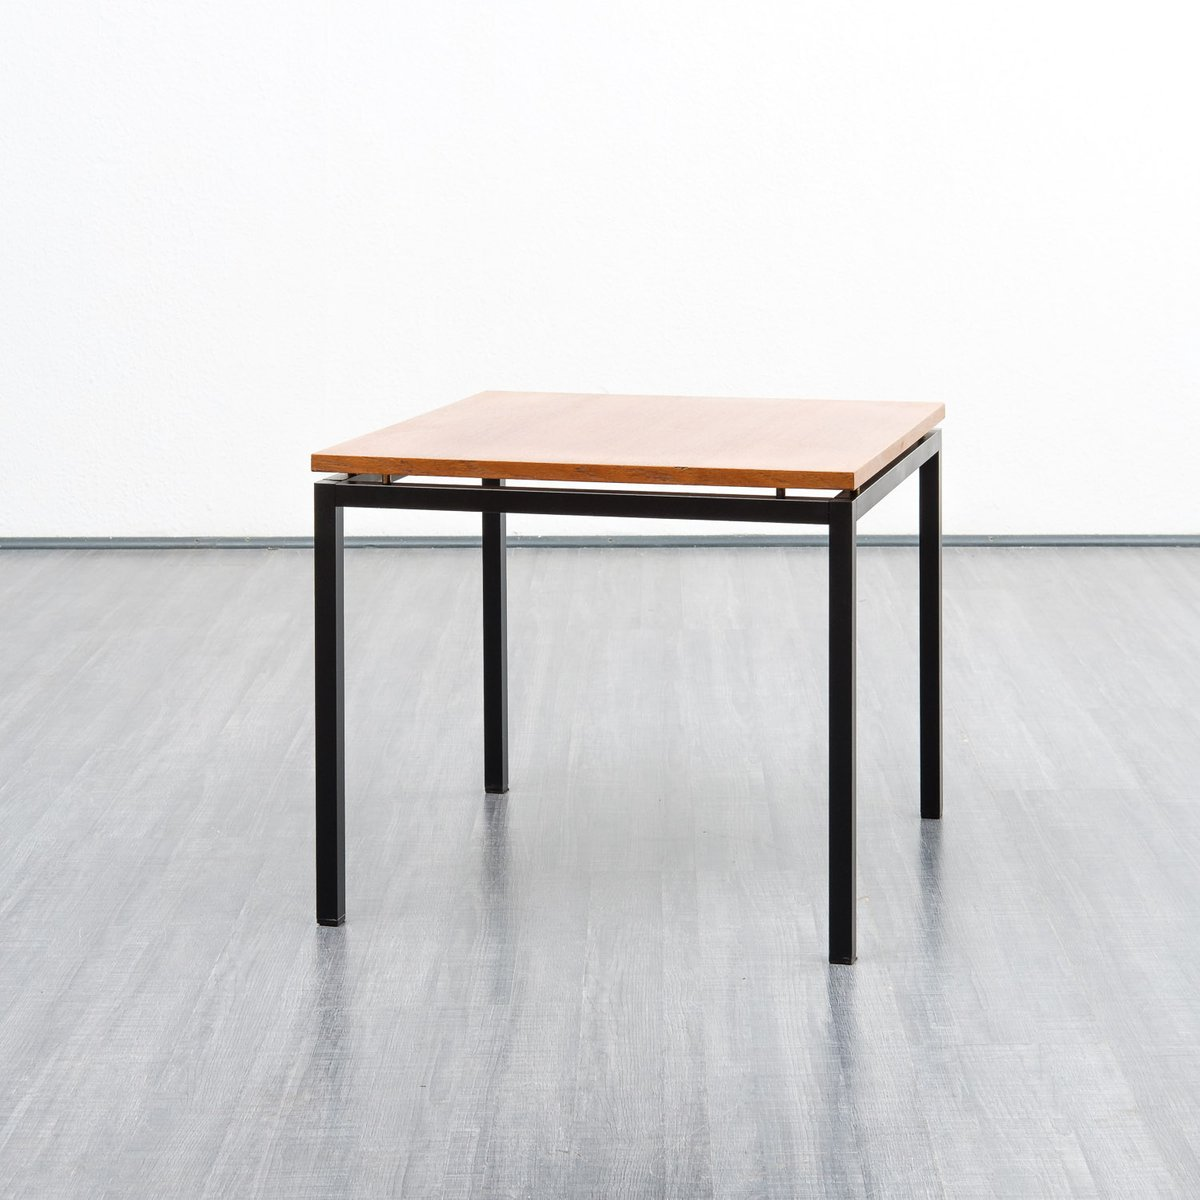 Vintage Teak & Metal Coffee Table, 1960s For Sale At Pamono